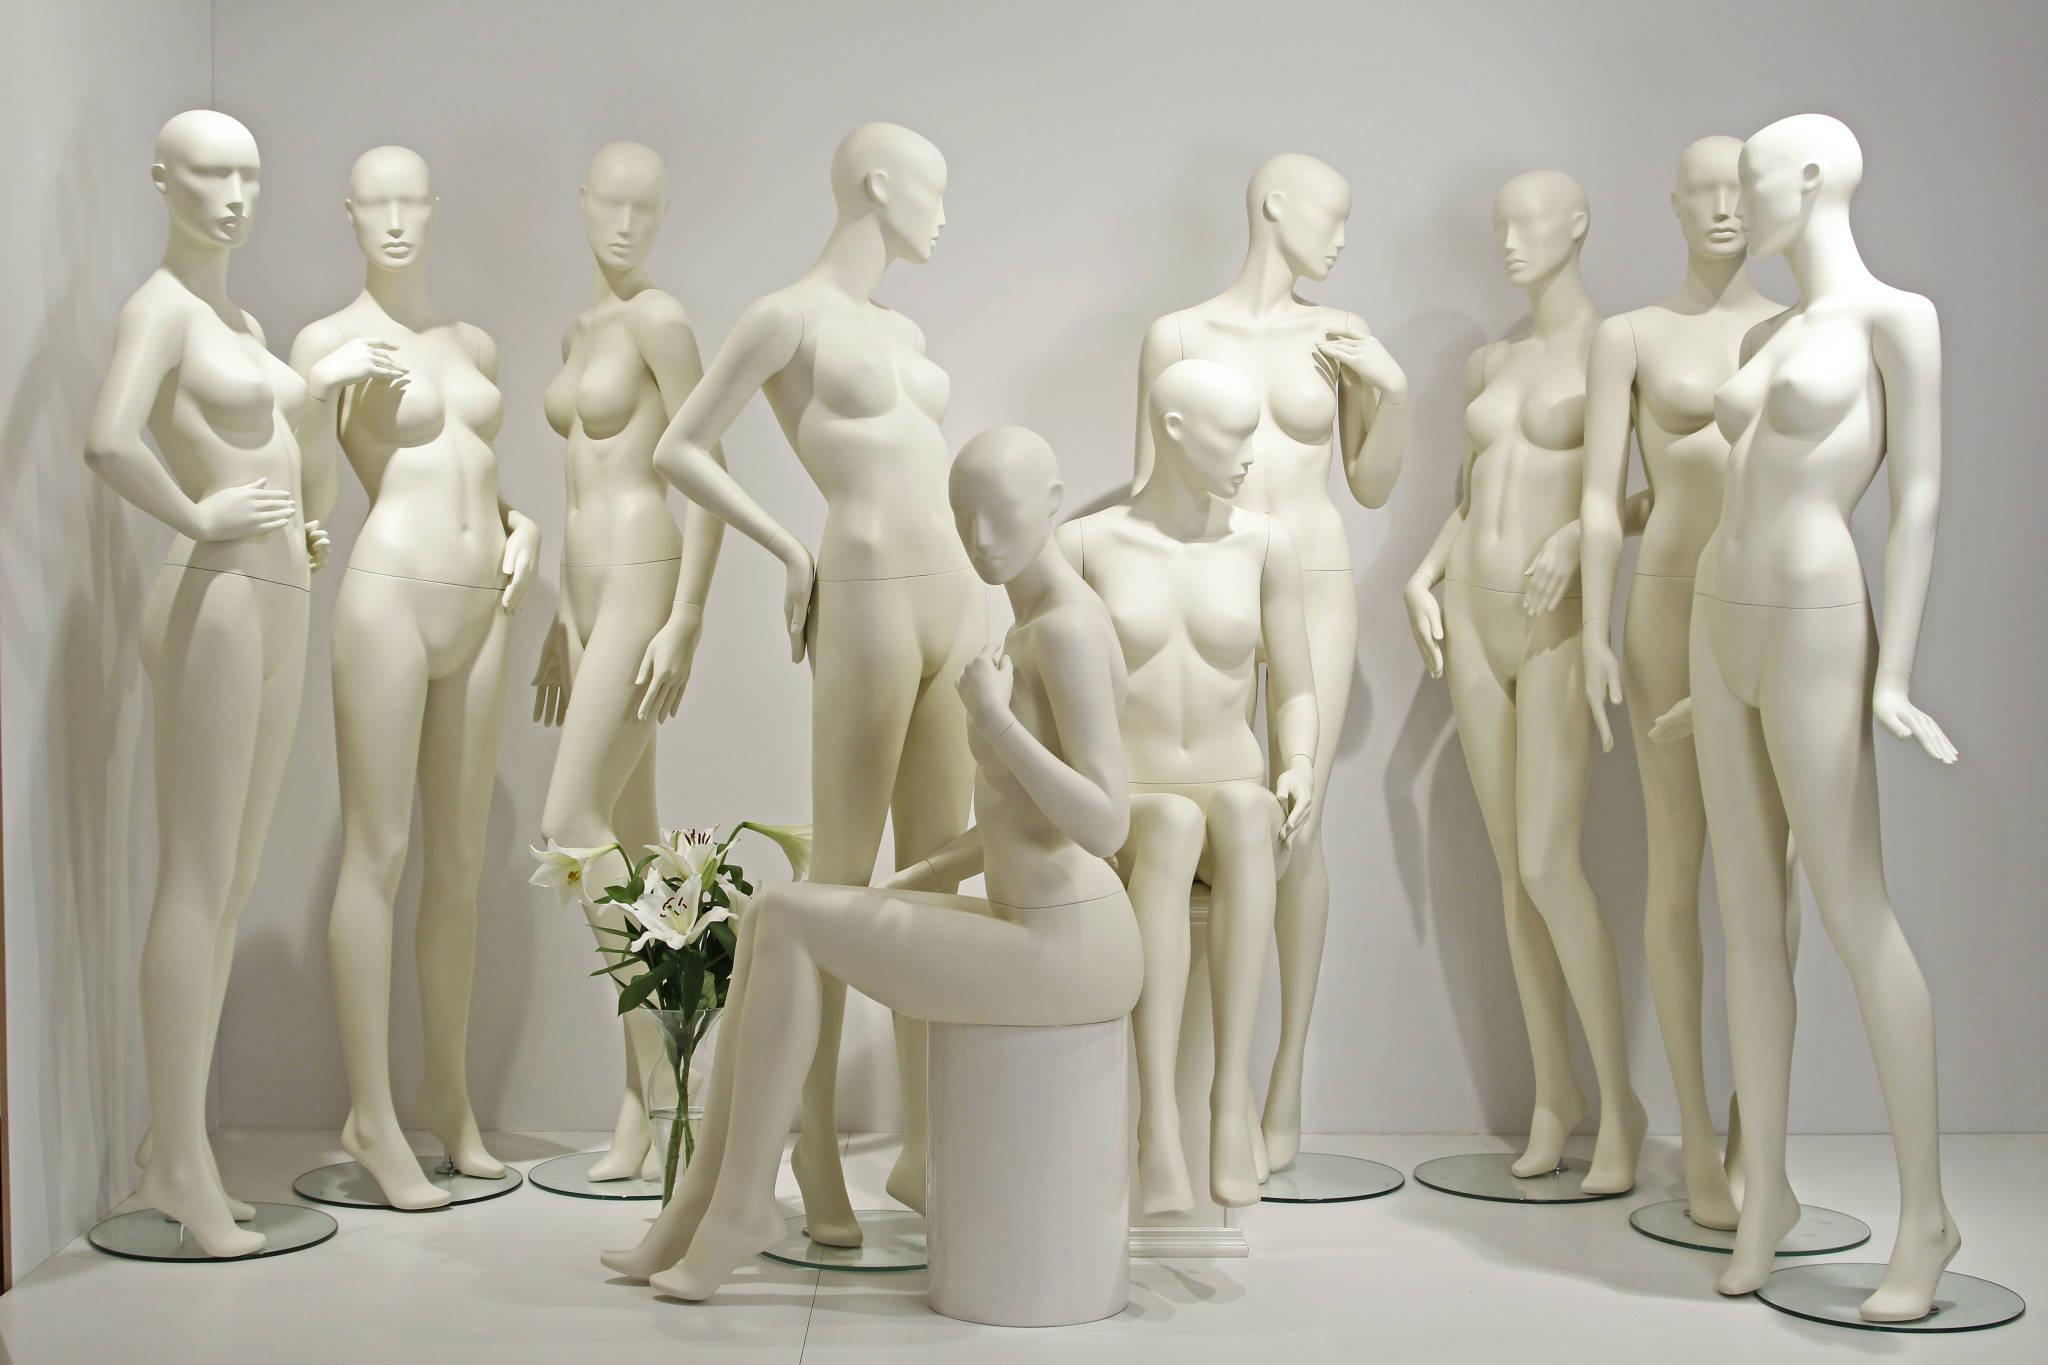 damemannequin kollektion